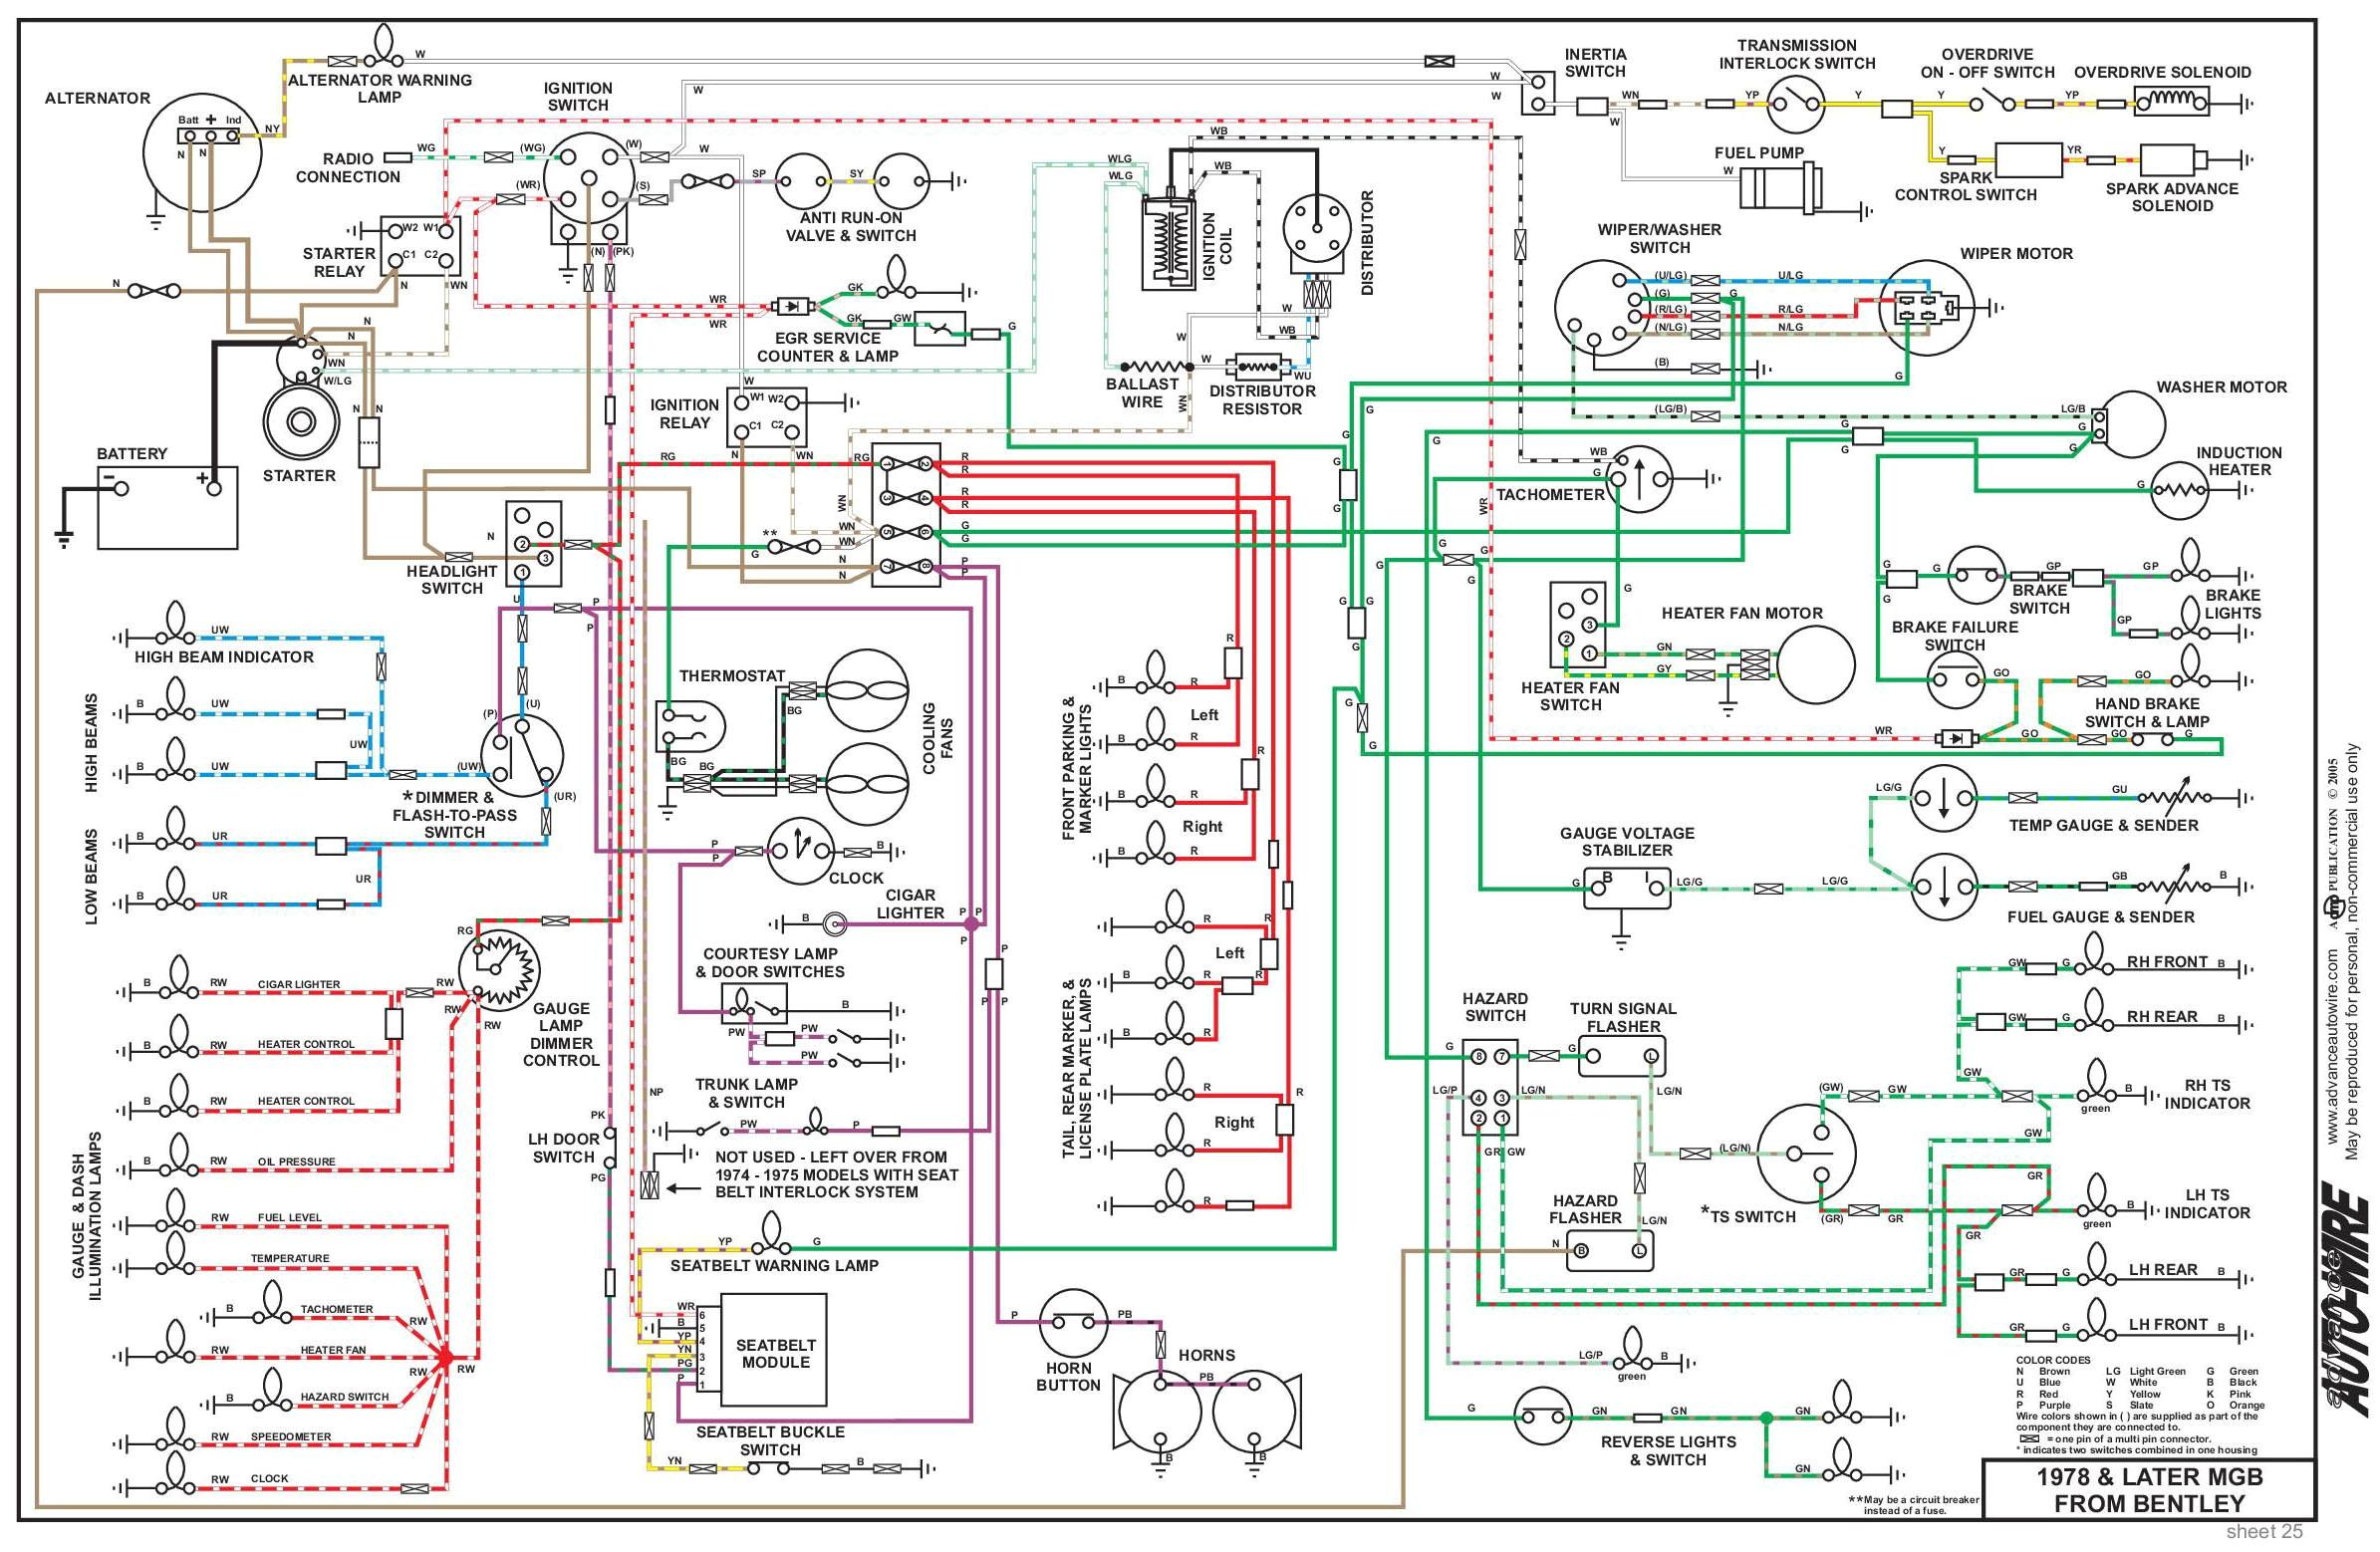 1977 mg mgb wiring diagram wiring diagram show 1973 mg mgb wiring diagram schematic